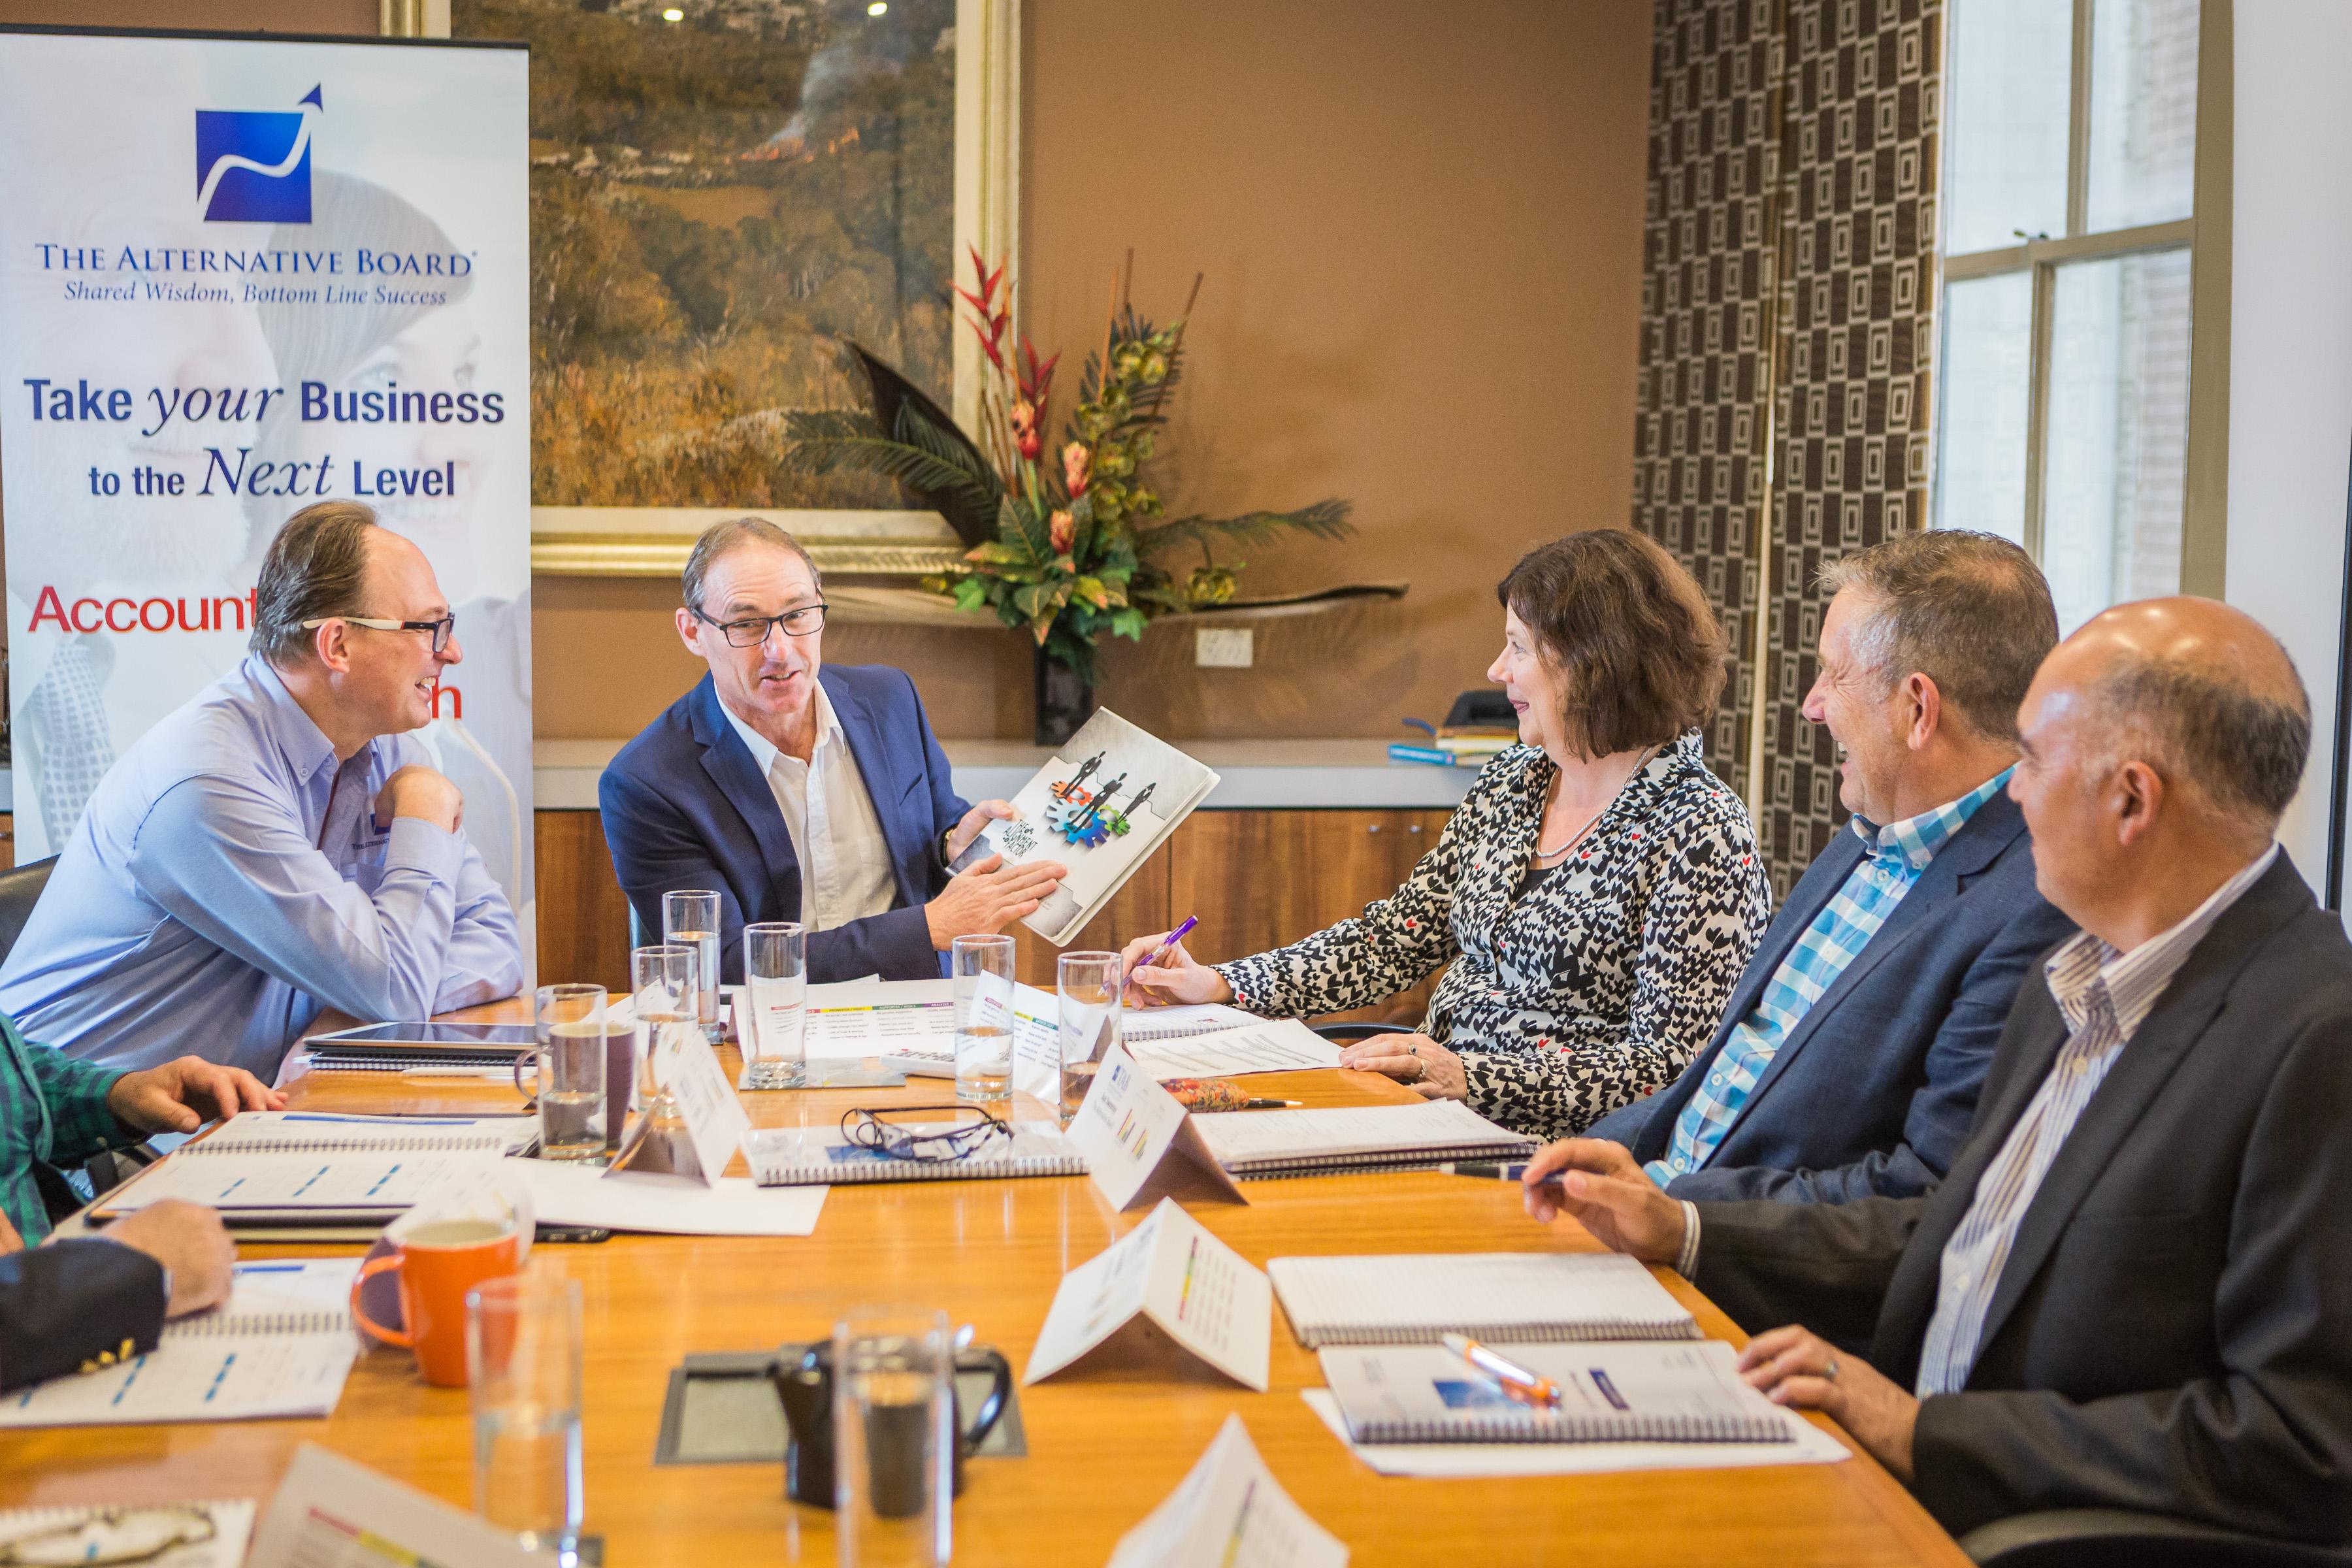 Business Coaching and Advisory Franchise - World's Best Coaching Service 2018